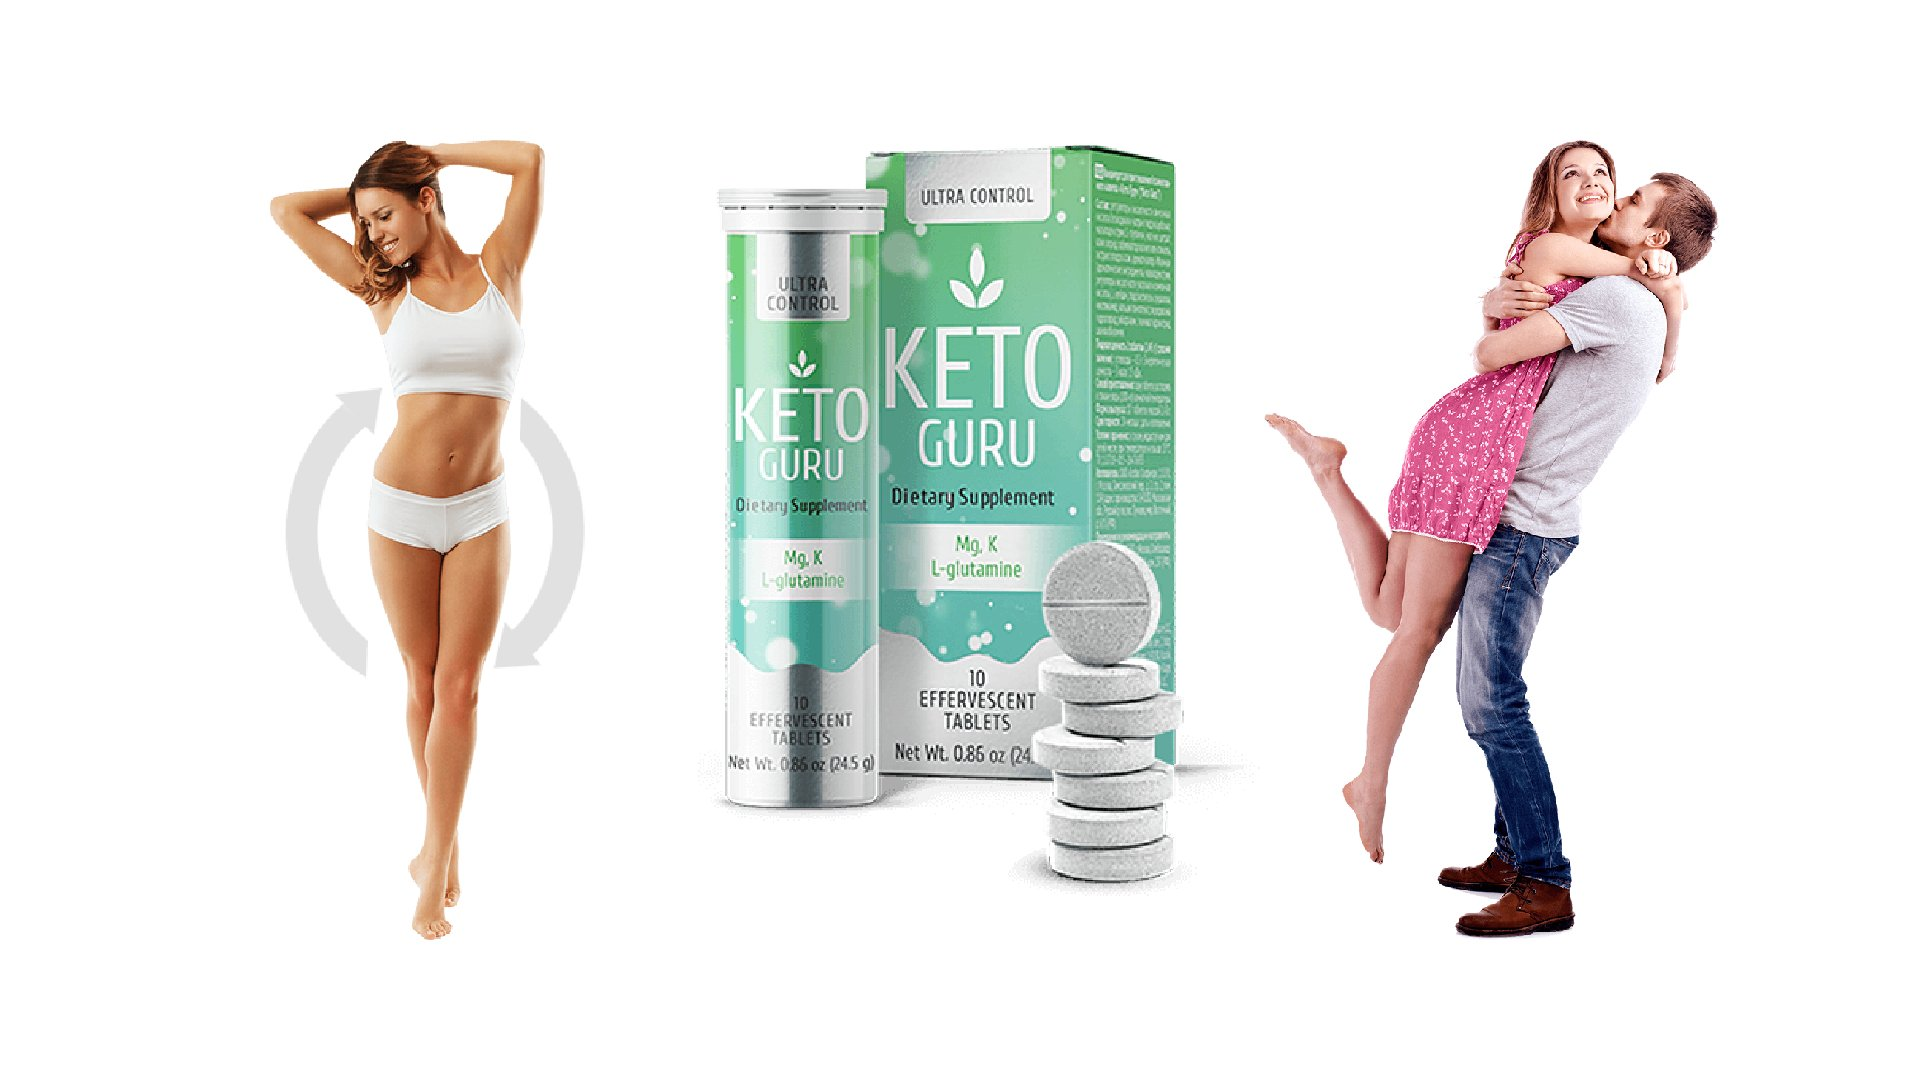 keto-guru-en-pharmacie-sur-amazon-site-du-fabricant-prix-ou-acheter